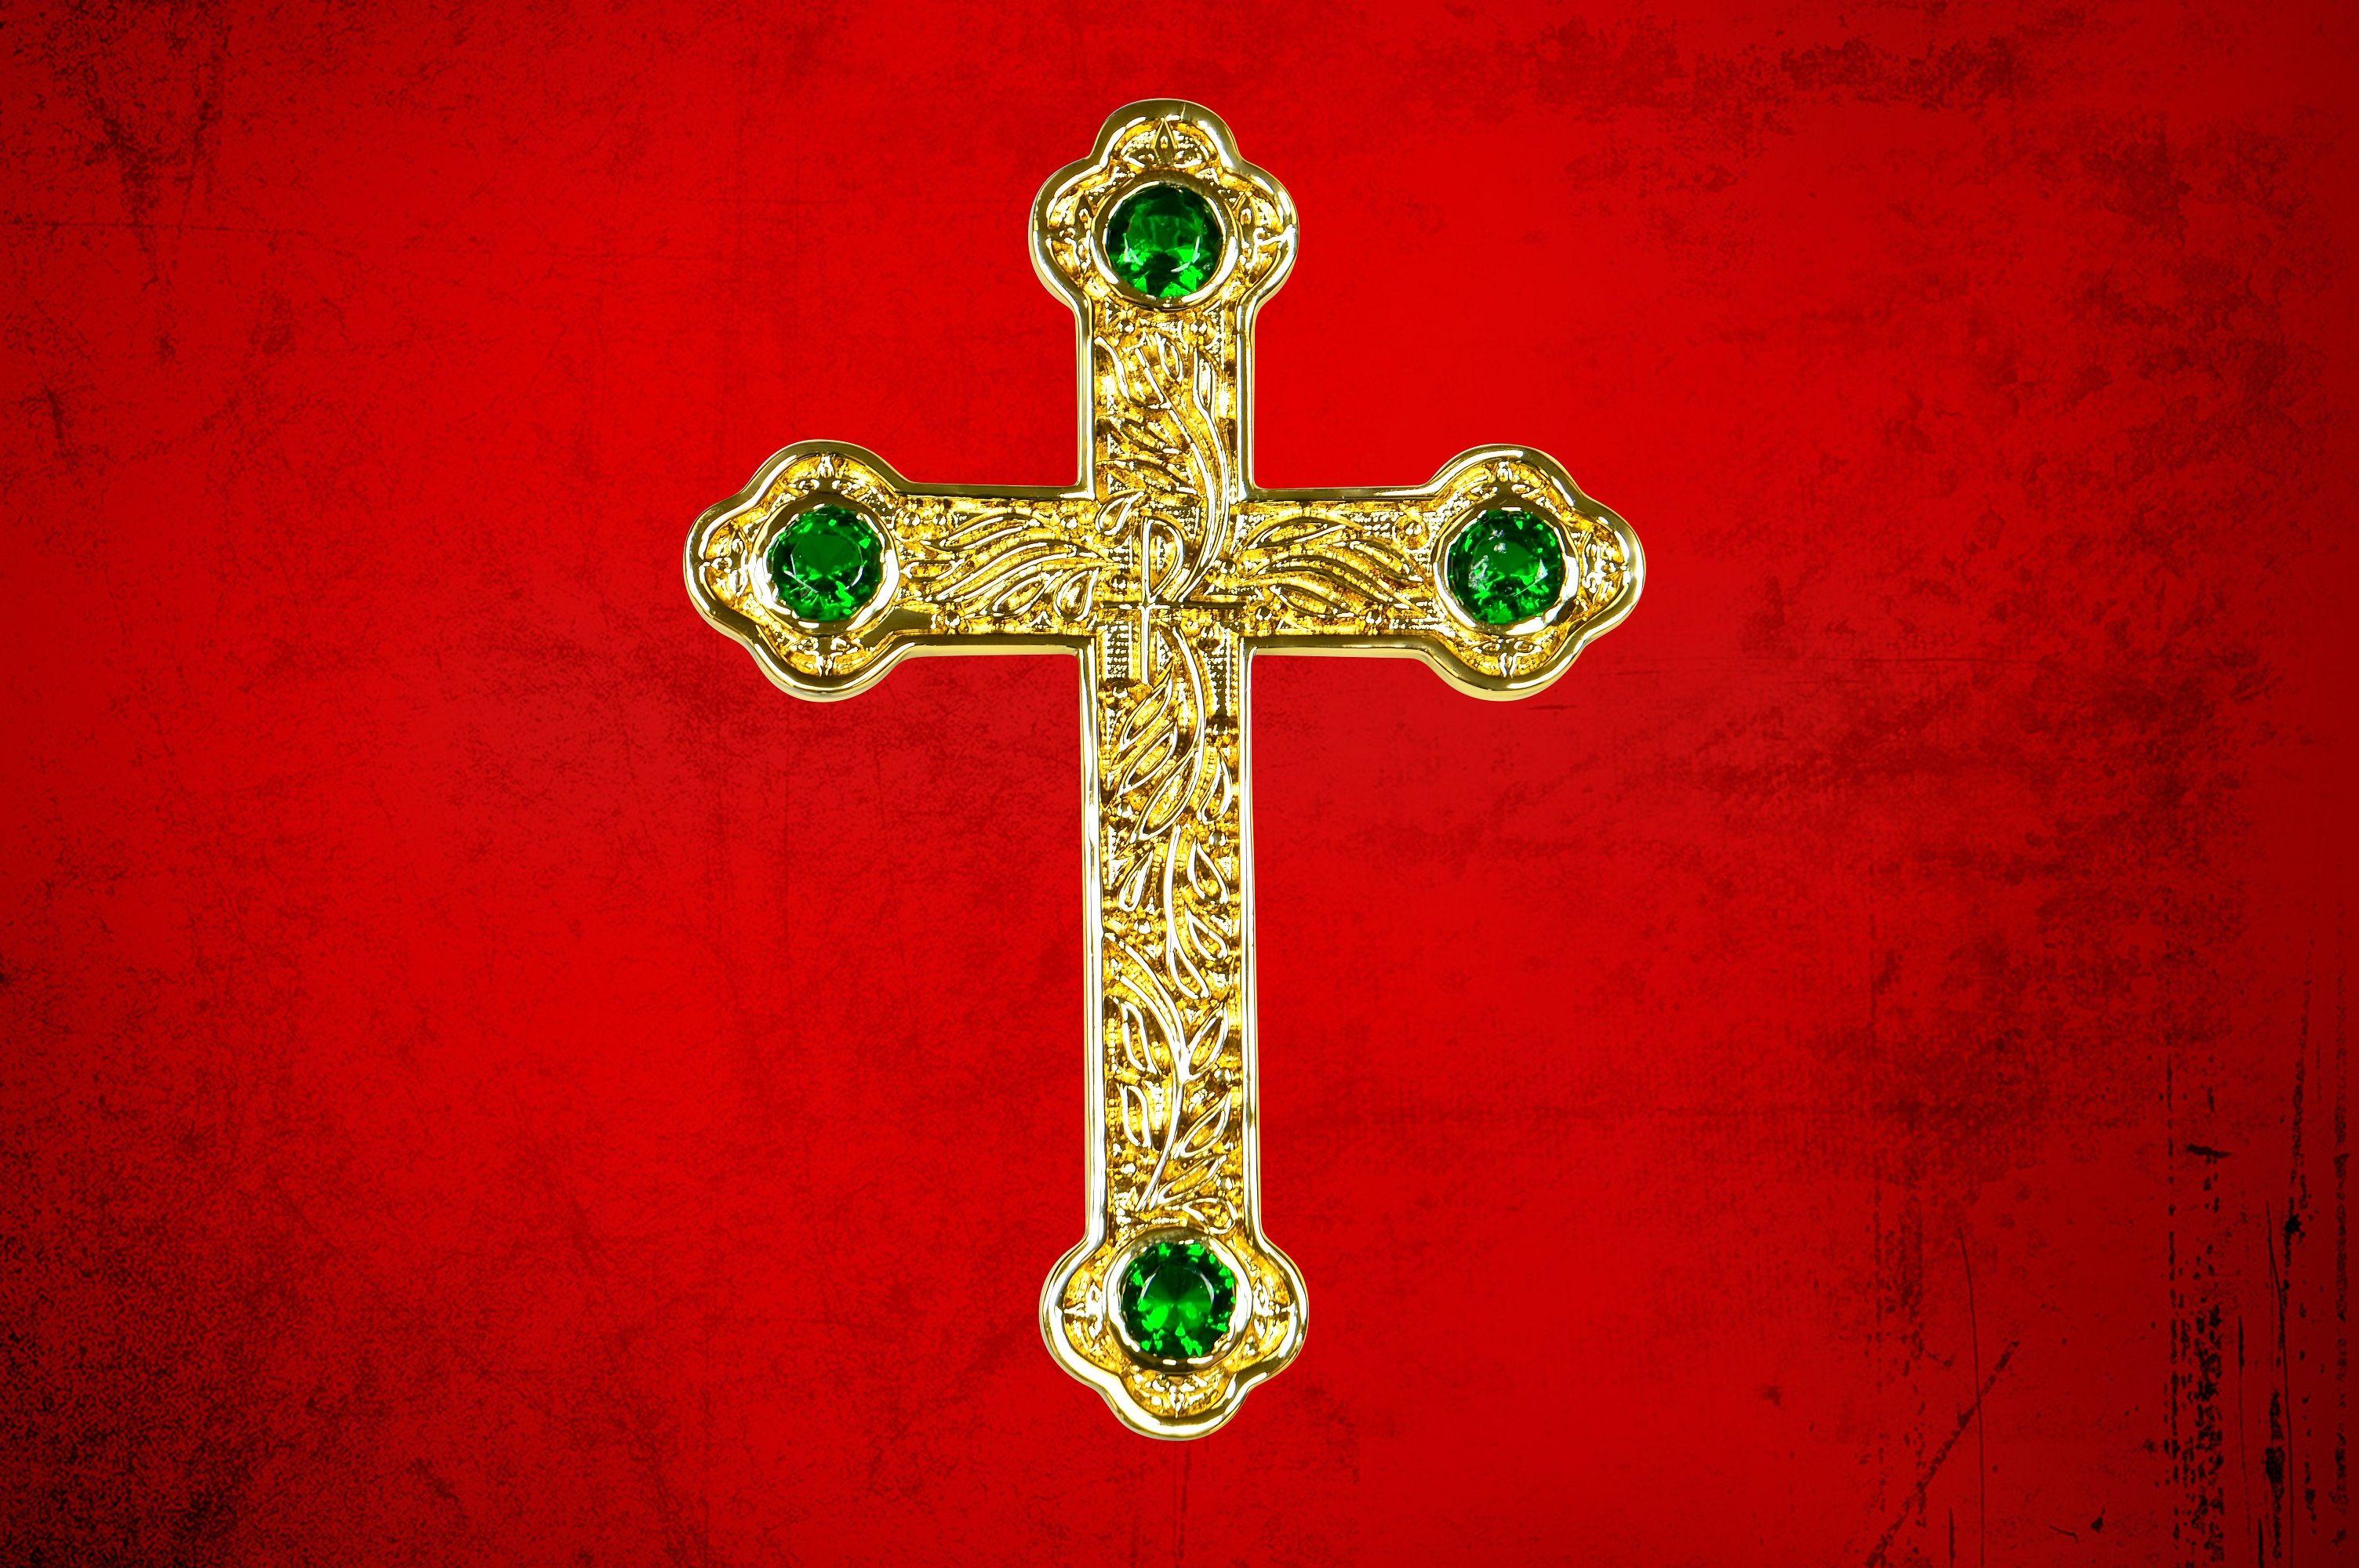 Premium Pectoral Cross Pendant & Chain Set with Emerald Green